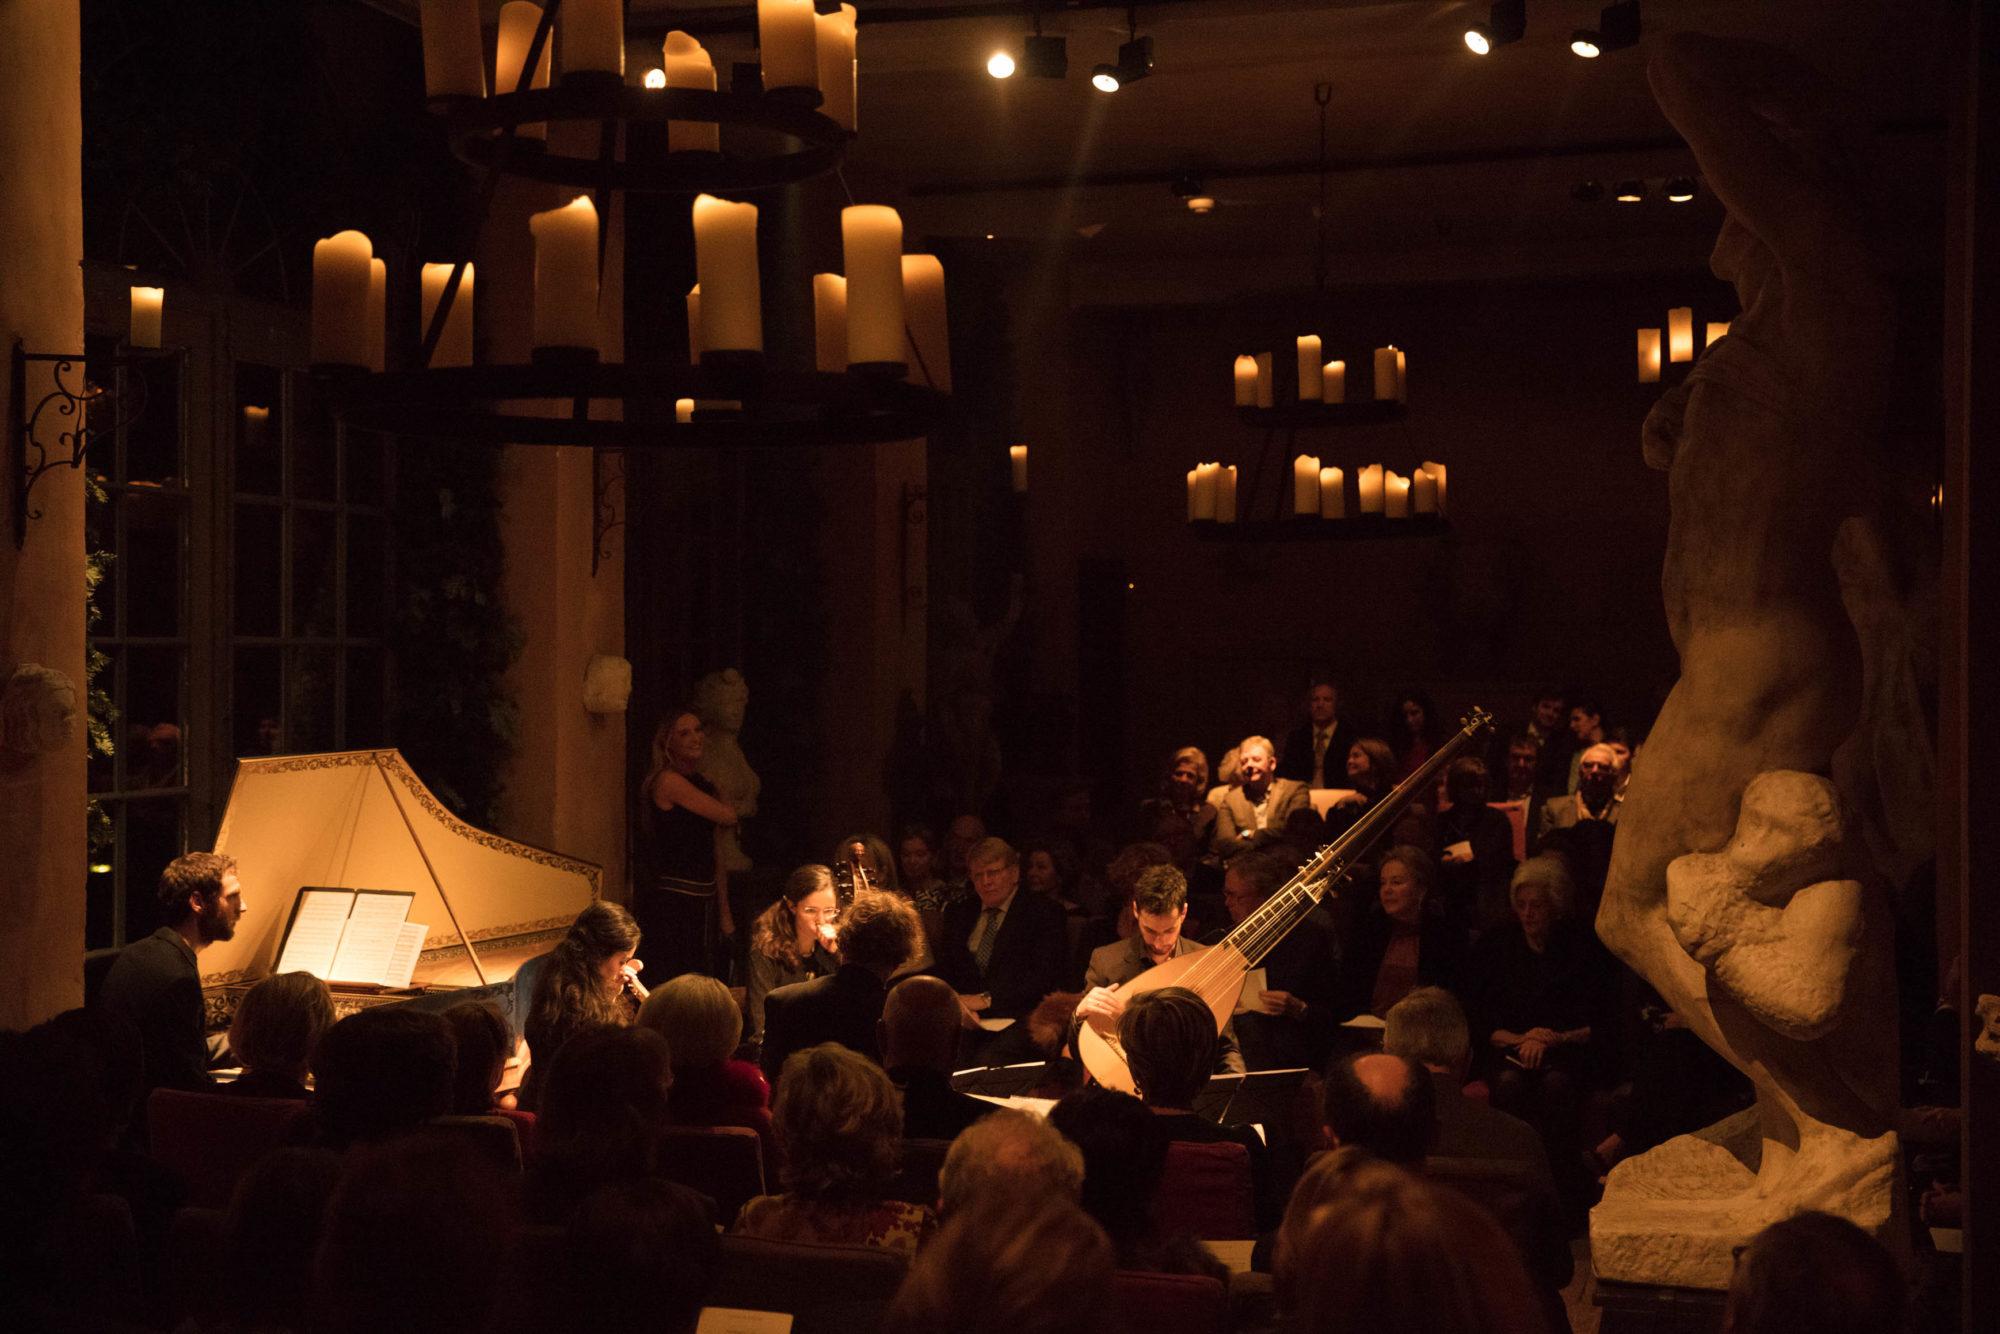 Inspiratum concert at the Castle of 's-Gravenwezel